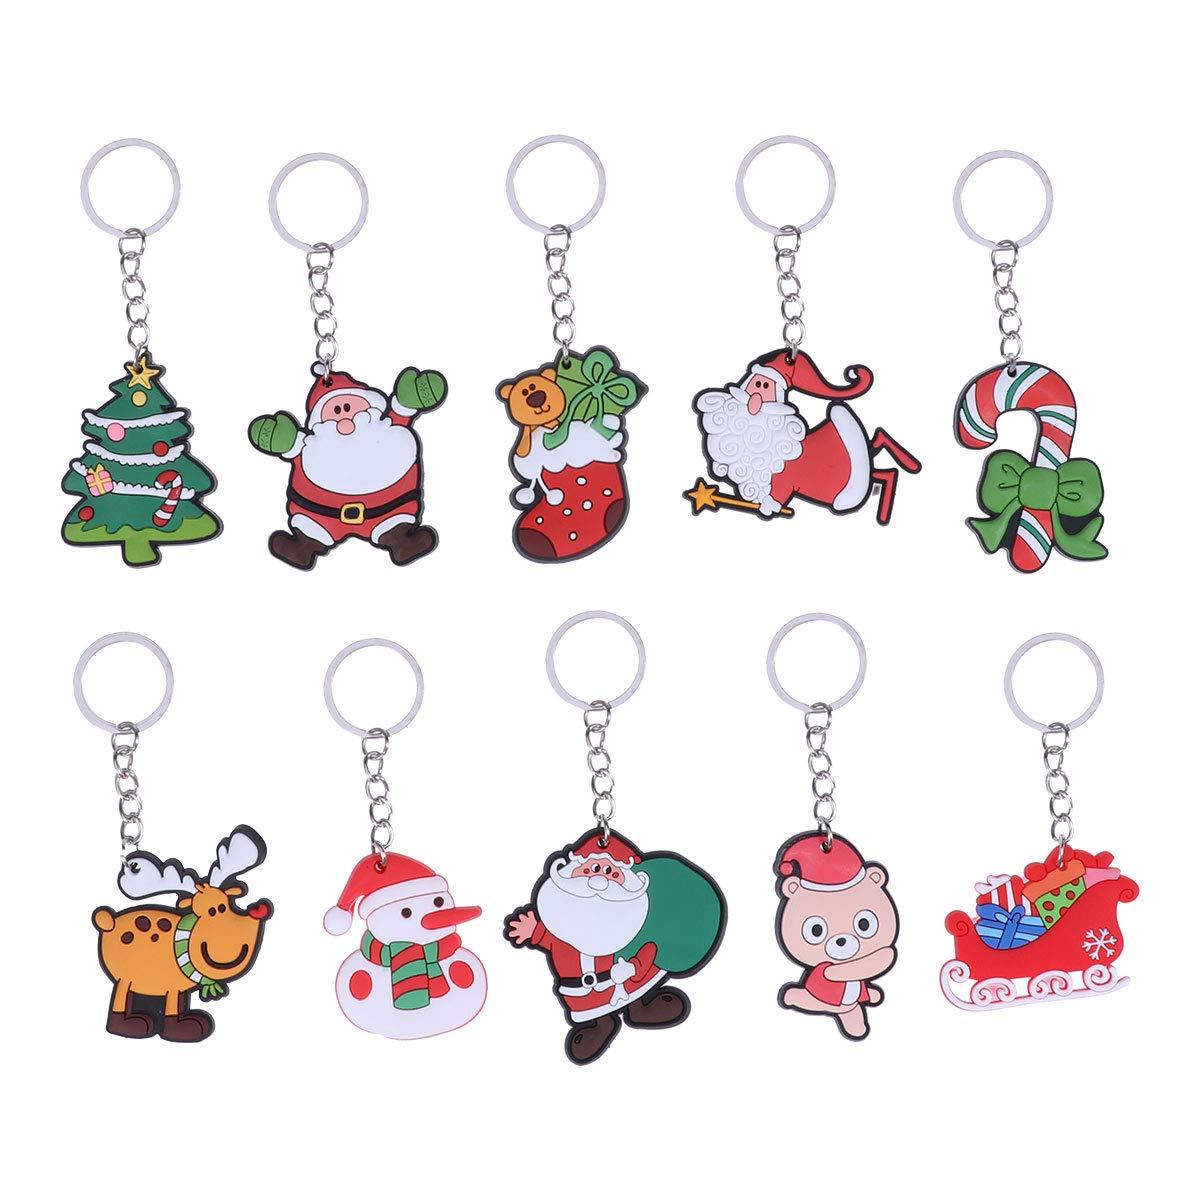 YeahiBaby 10PCS Christmas Keyring Keychain Car Purse Bag Pendant Decoration Christmas Party Ornaments